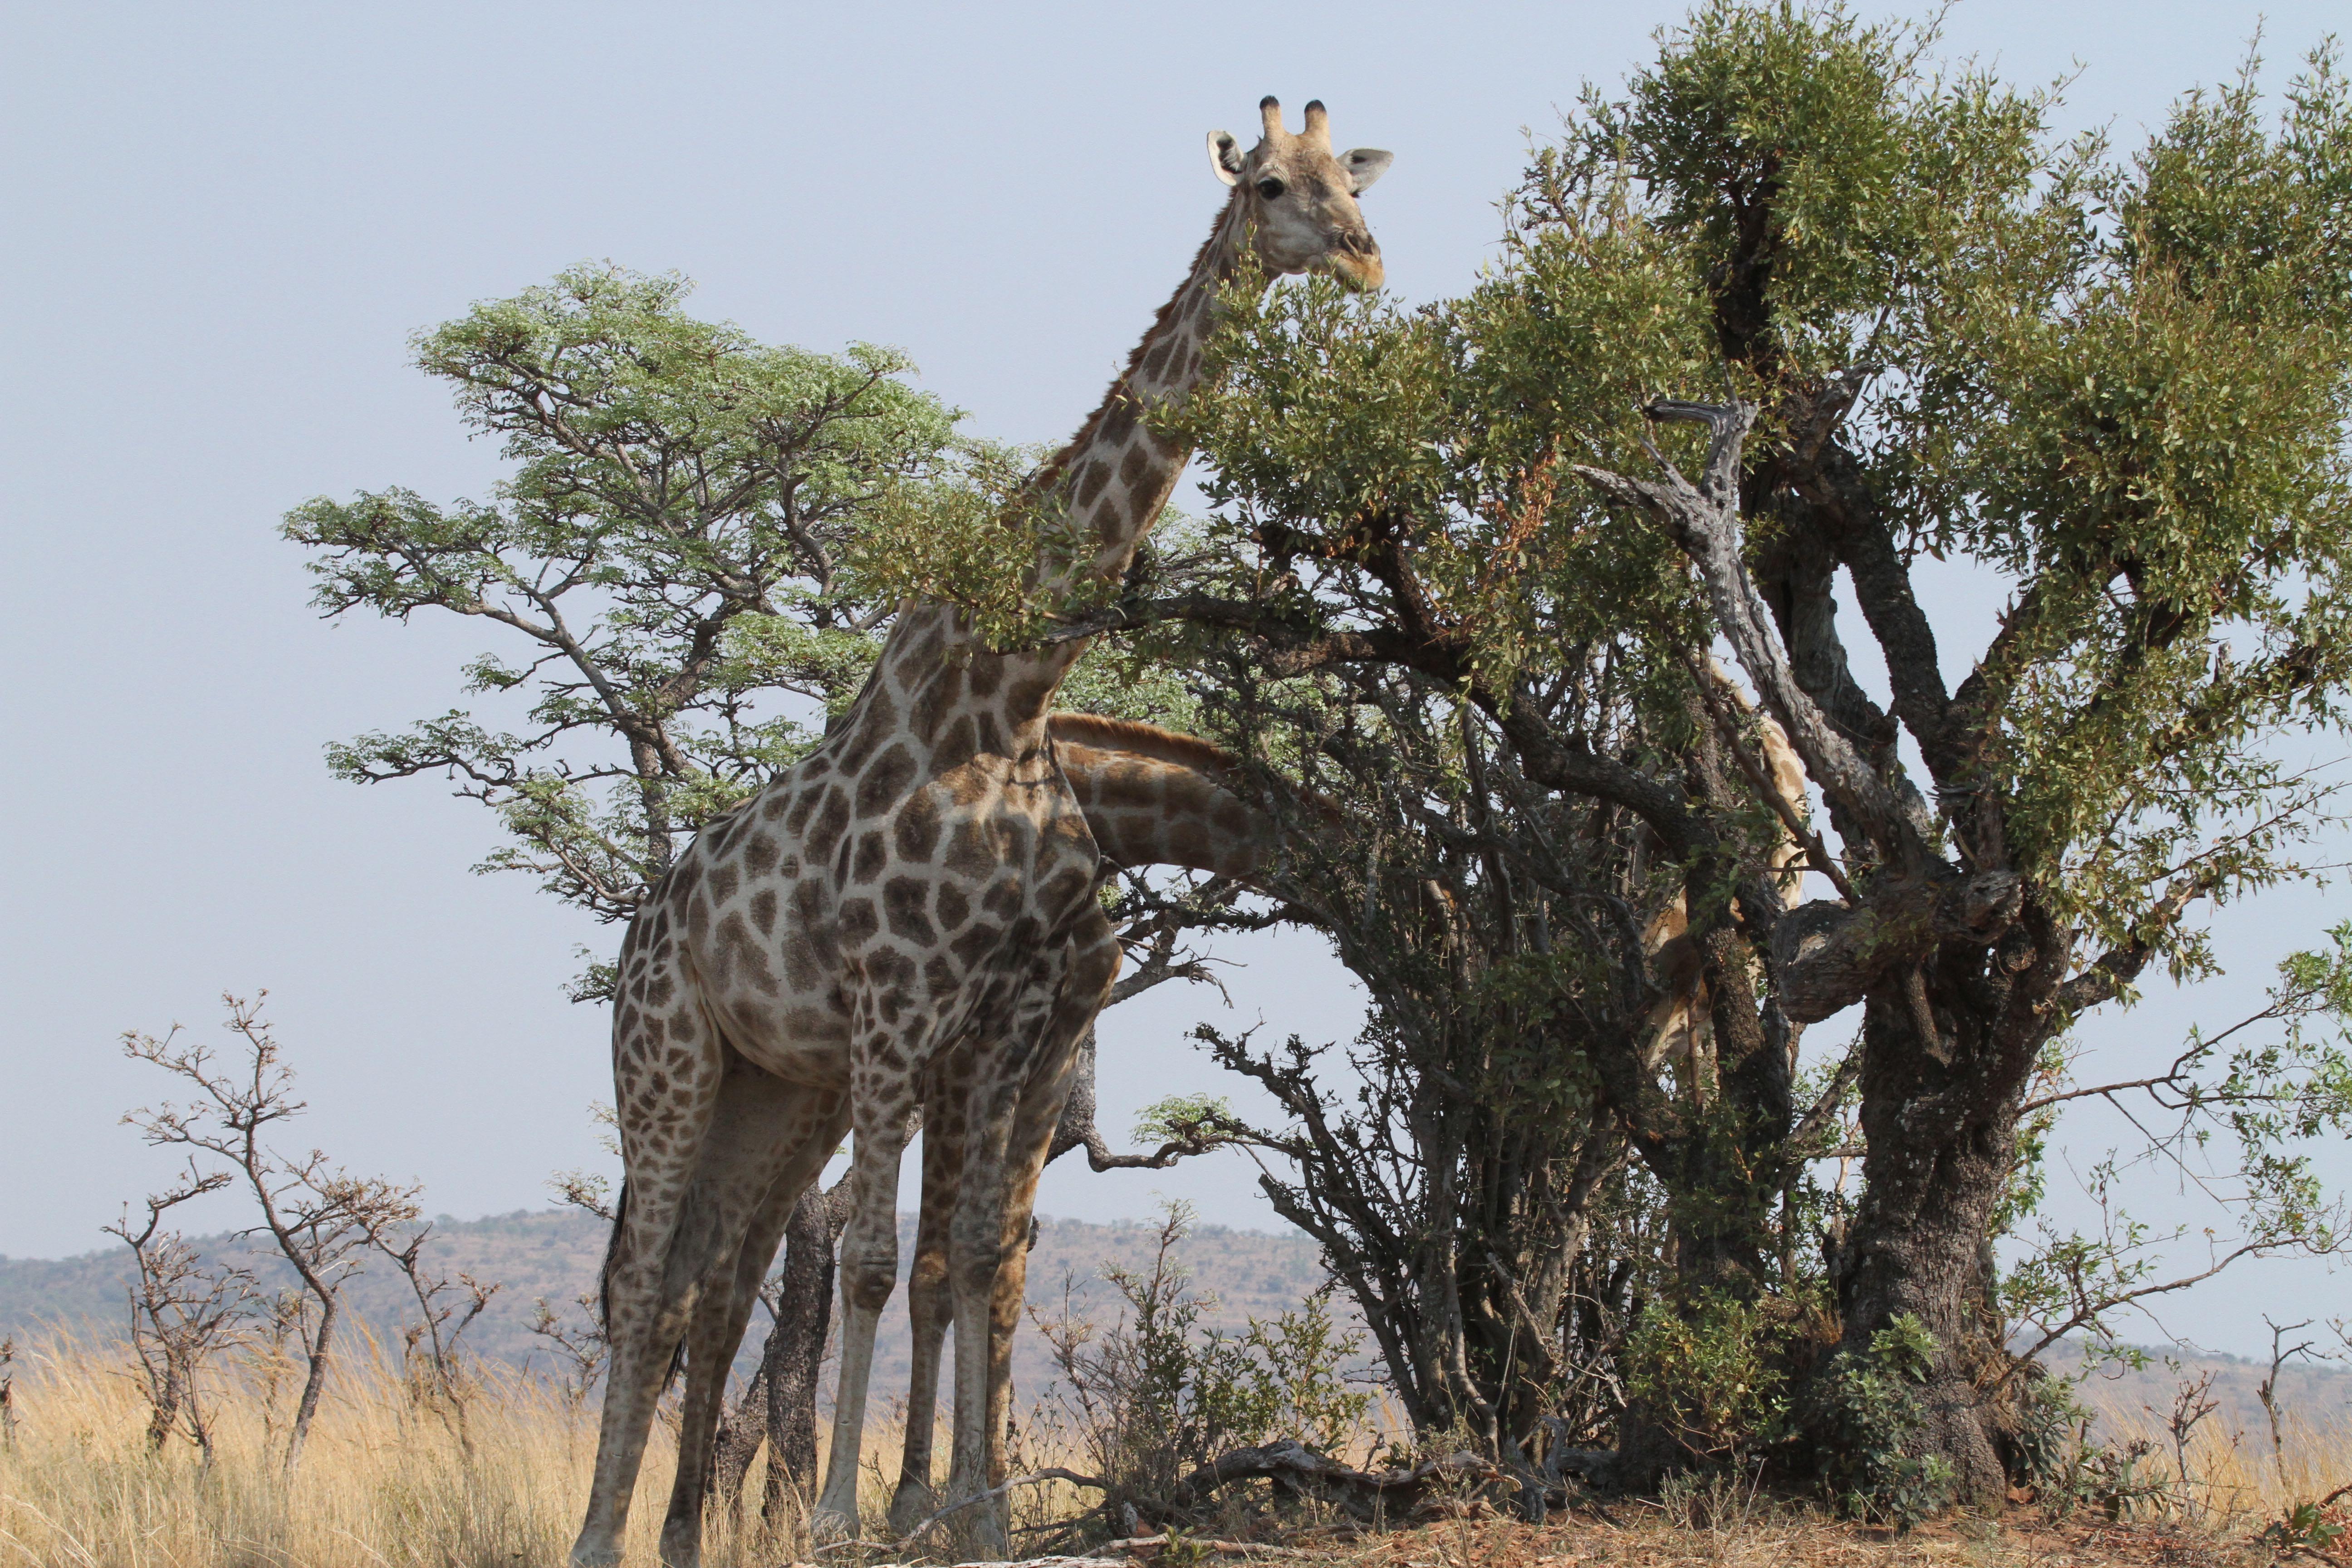 Giraffes enjoying lunch